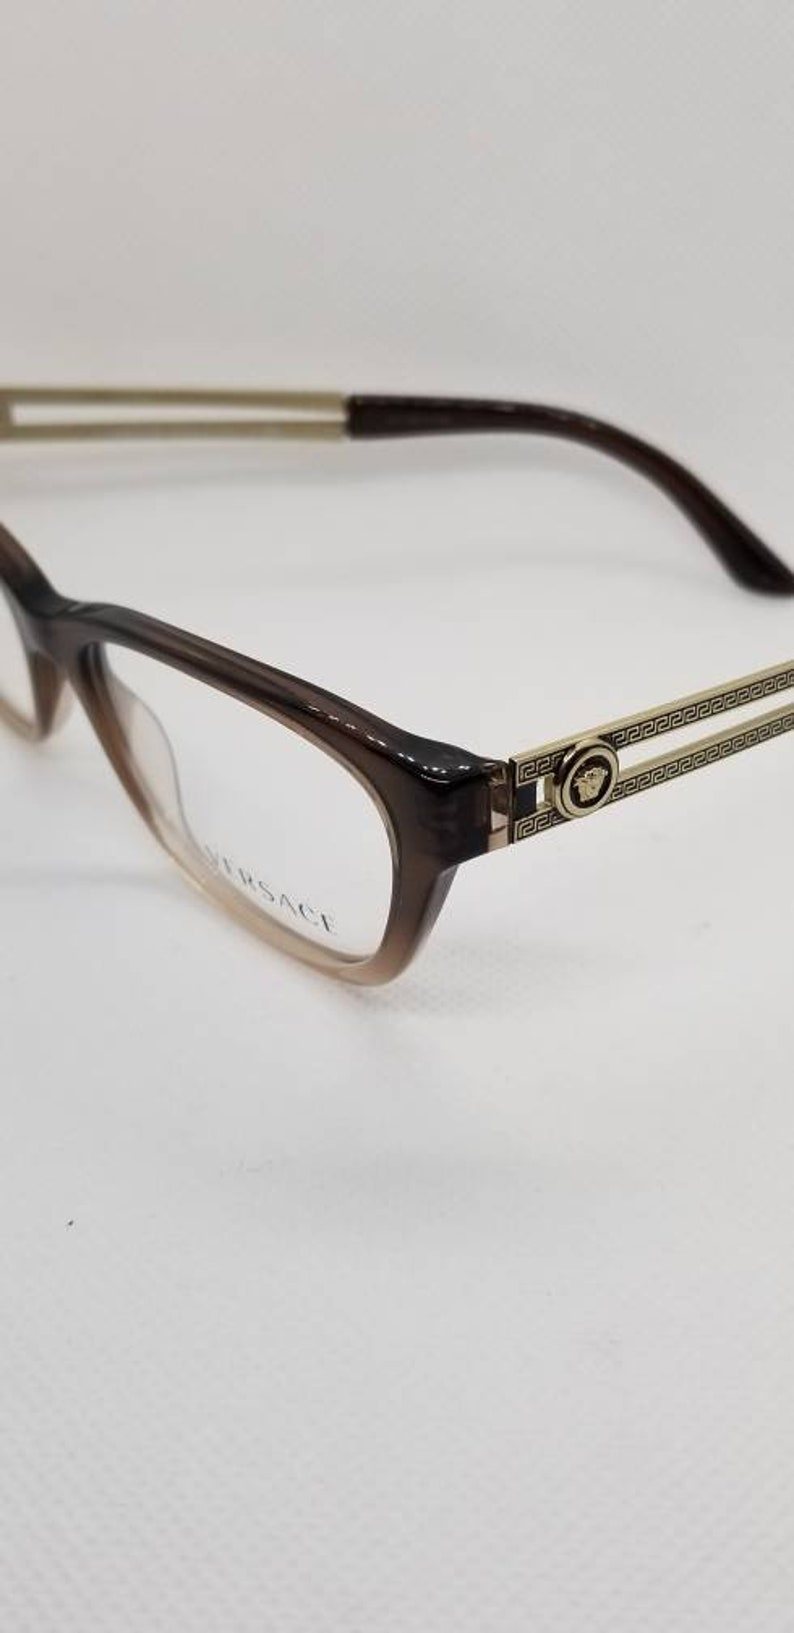 ce699a9a86185 Vintage New Old Stock Versace Gold Eyeglasses Frames Mod 3220